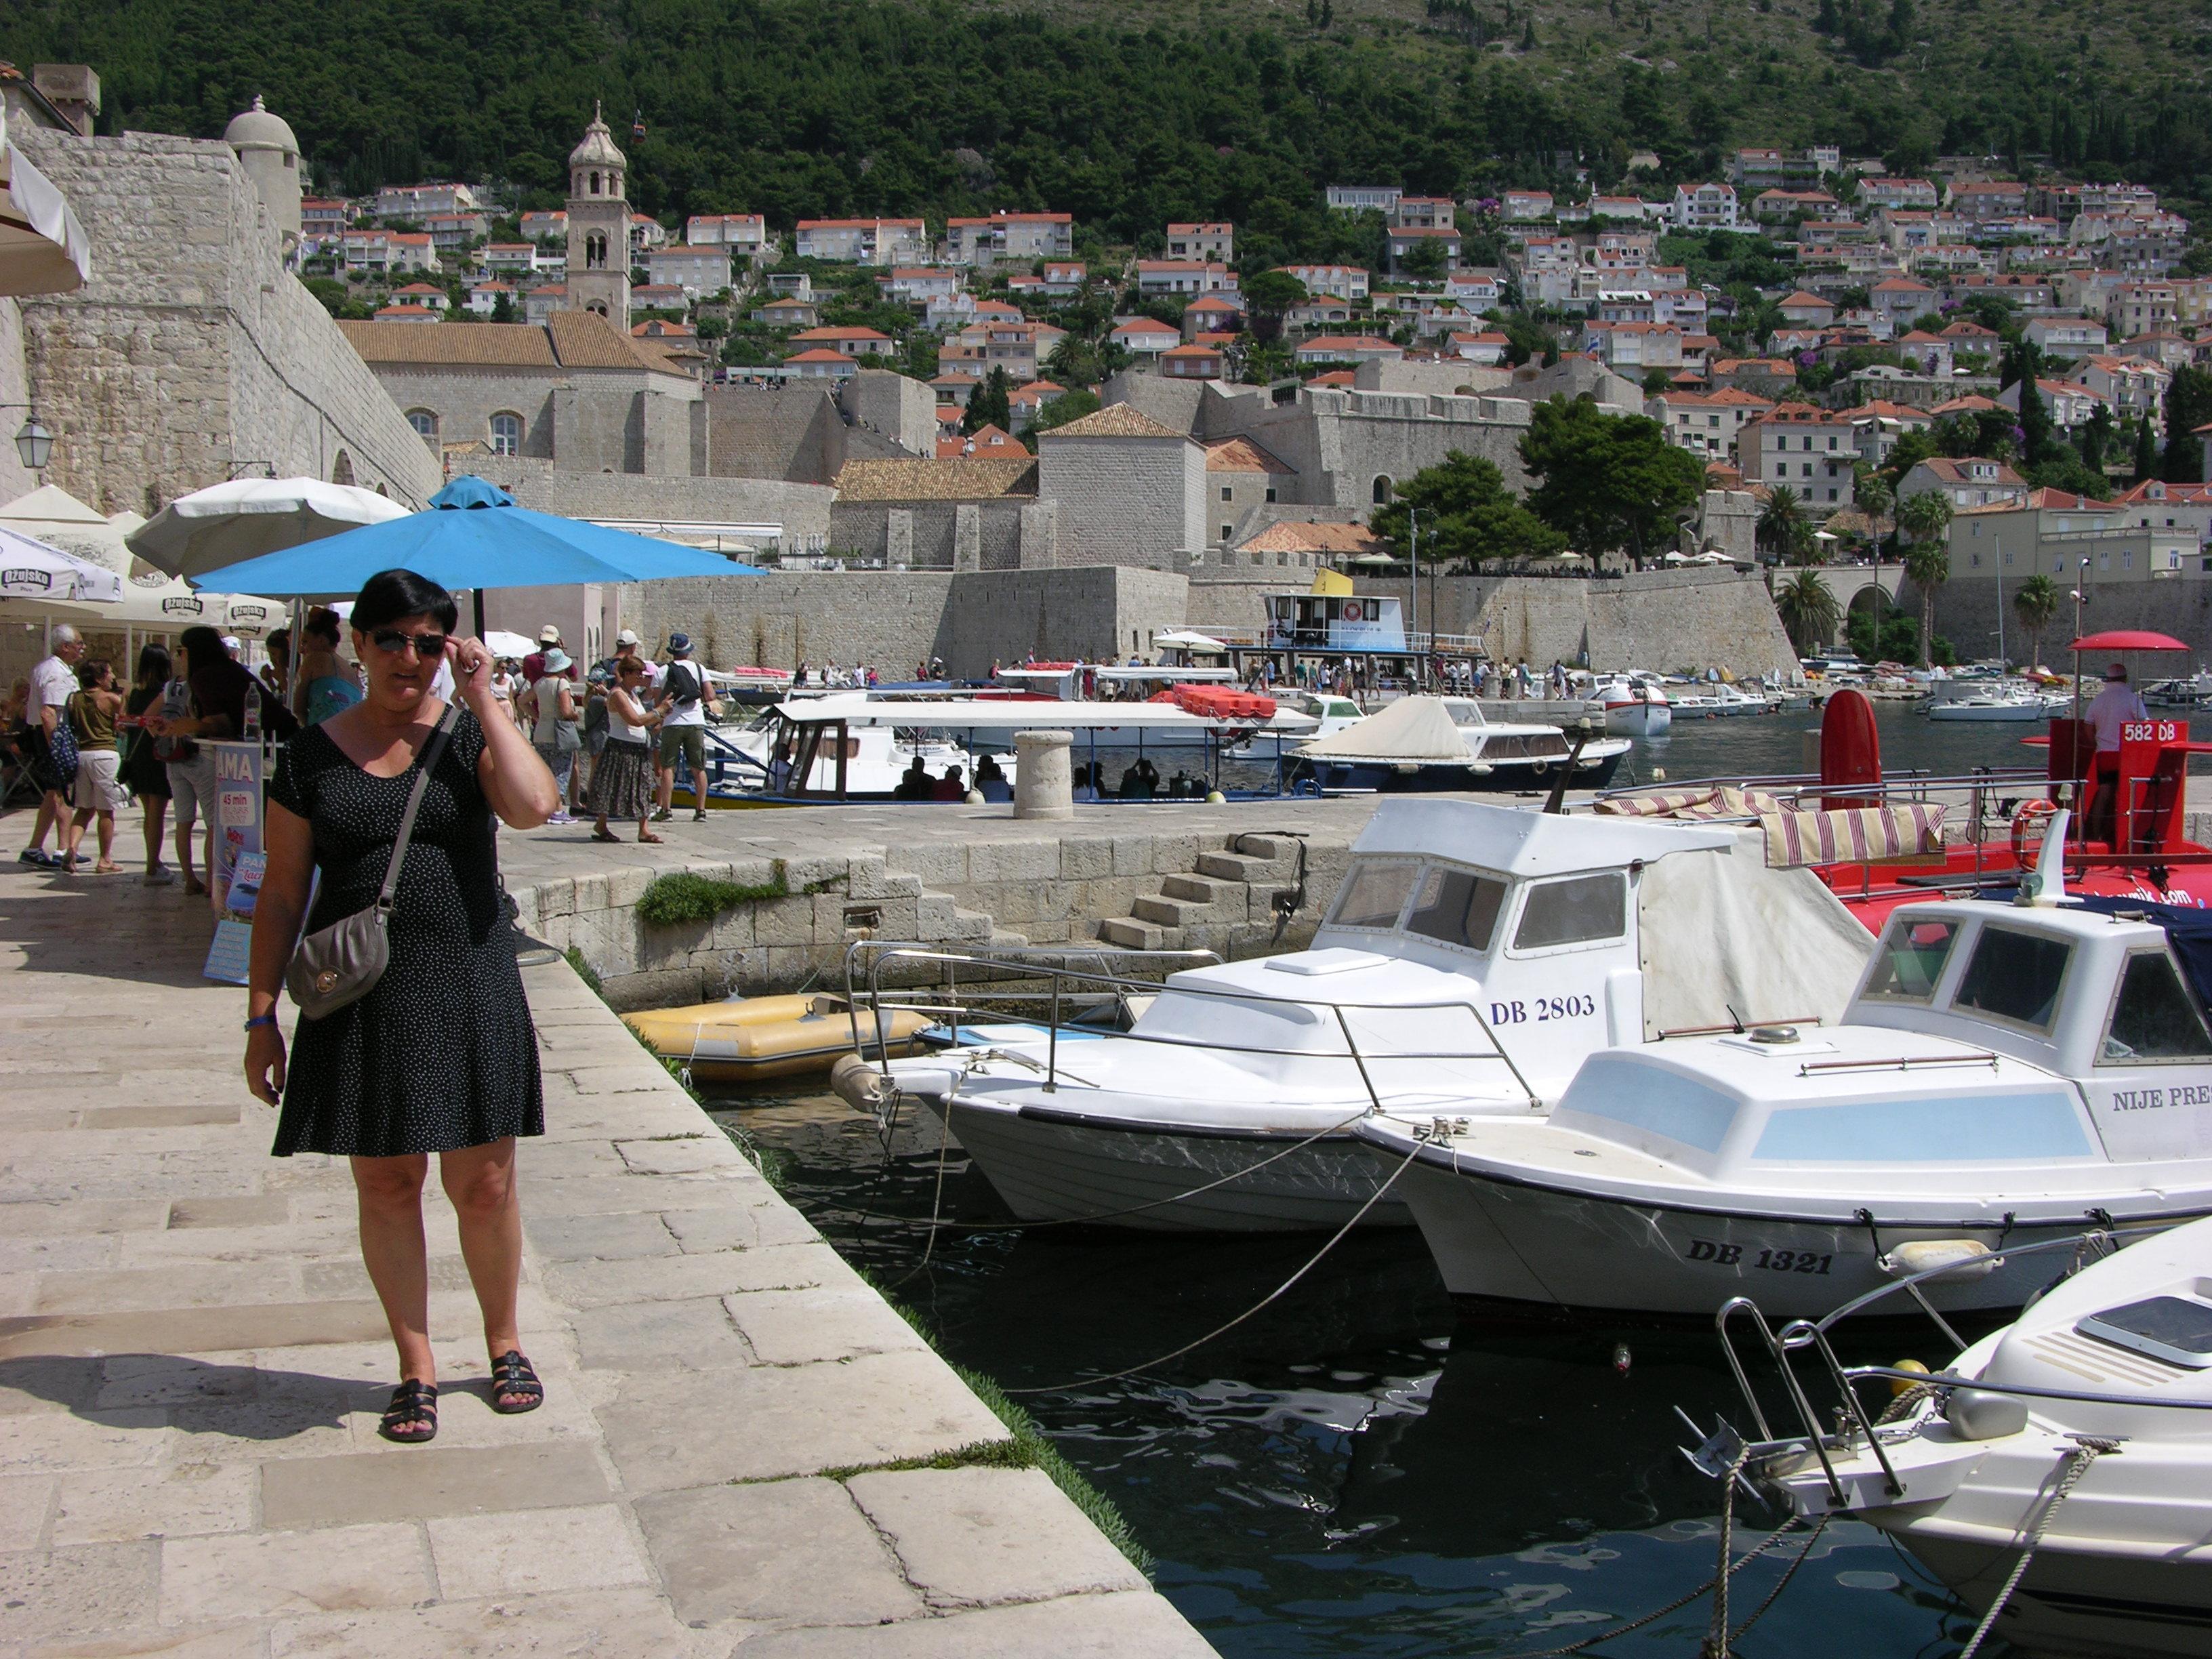 De retour de vacances en Croatie 160709111101487047